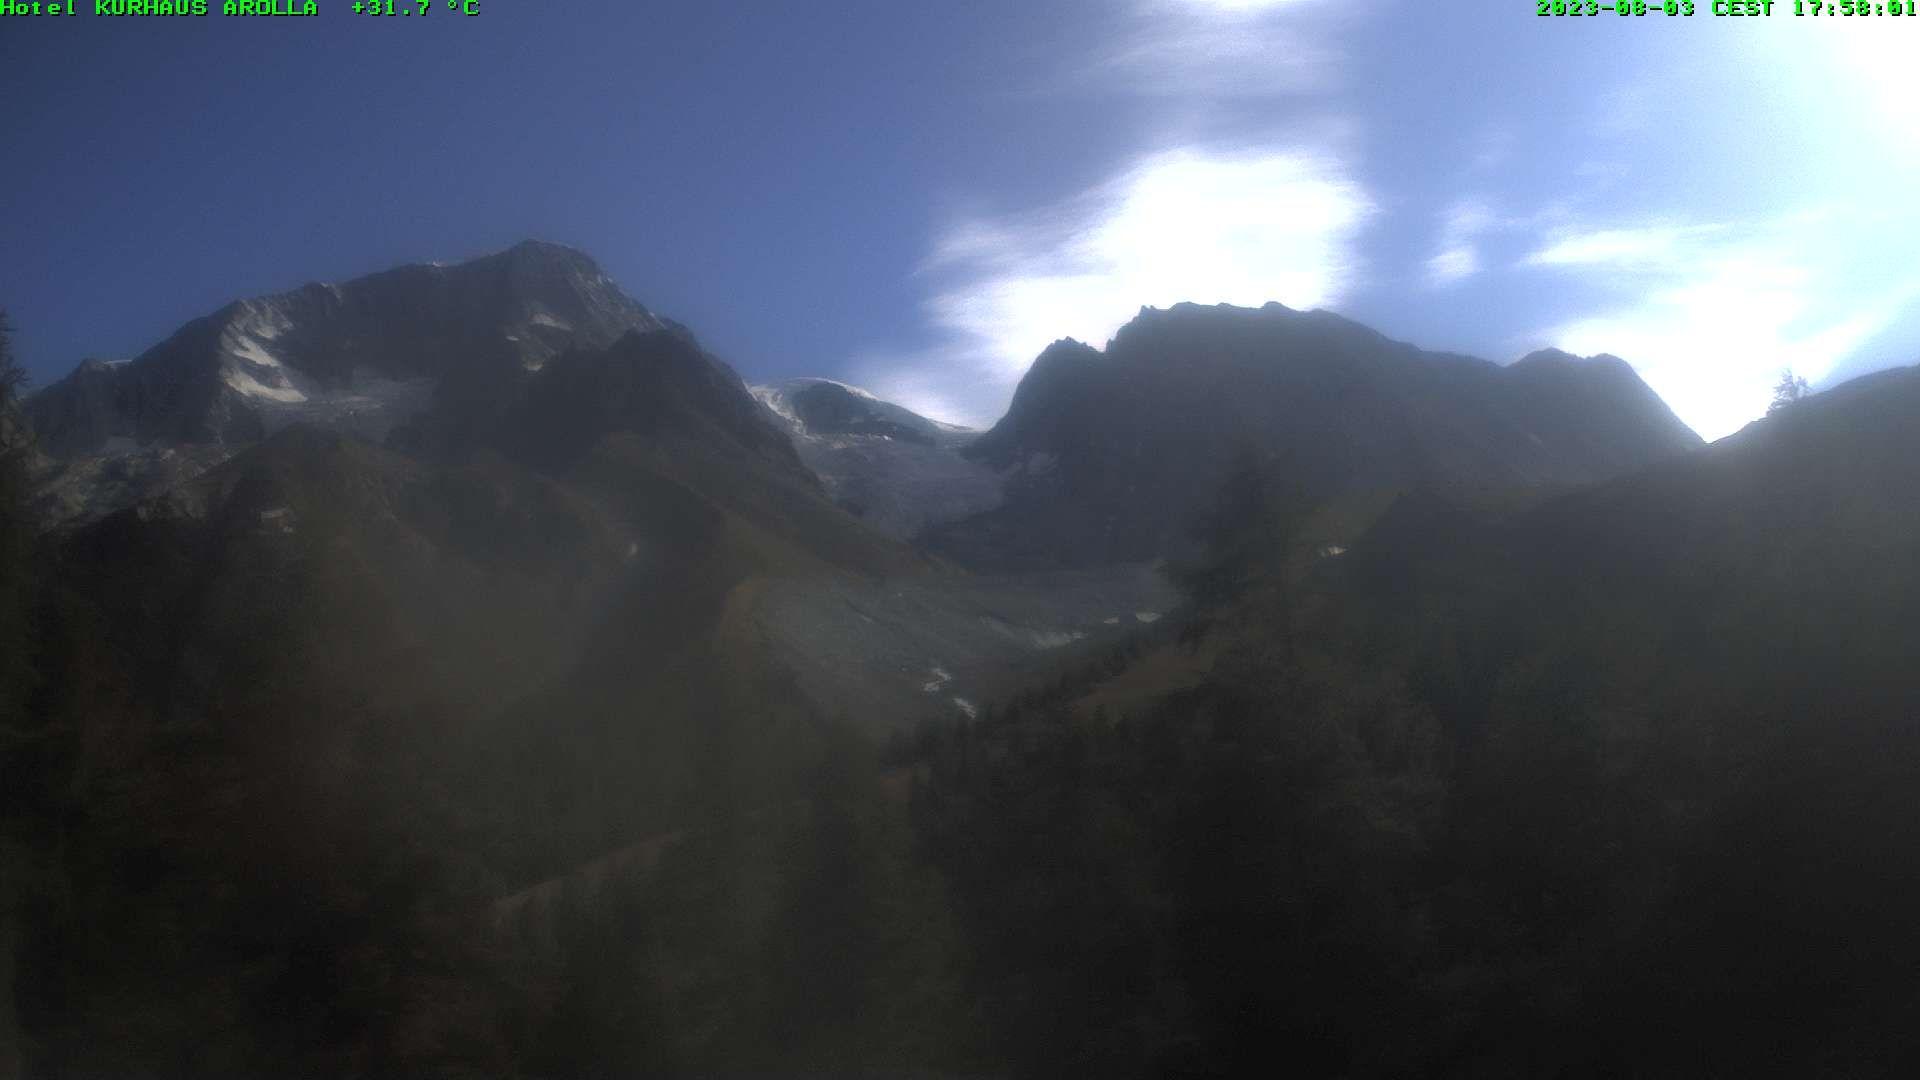 Evolène: Cugy - Vaud